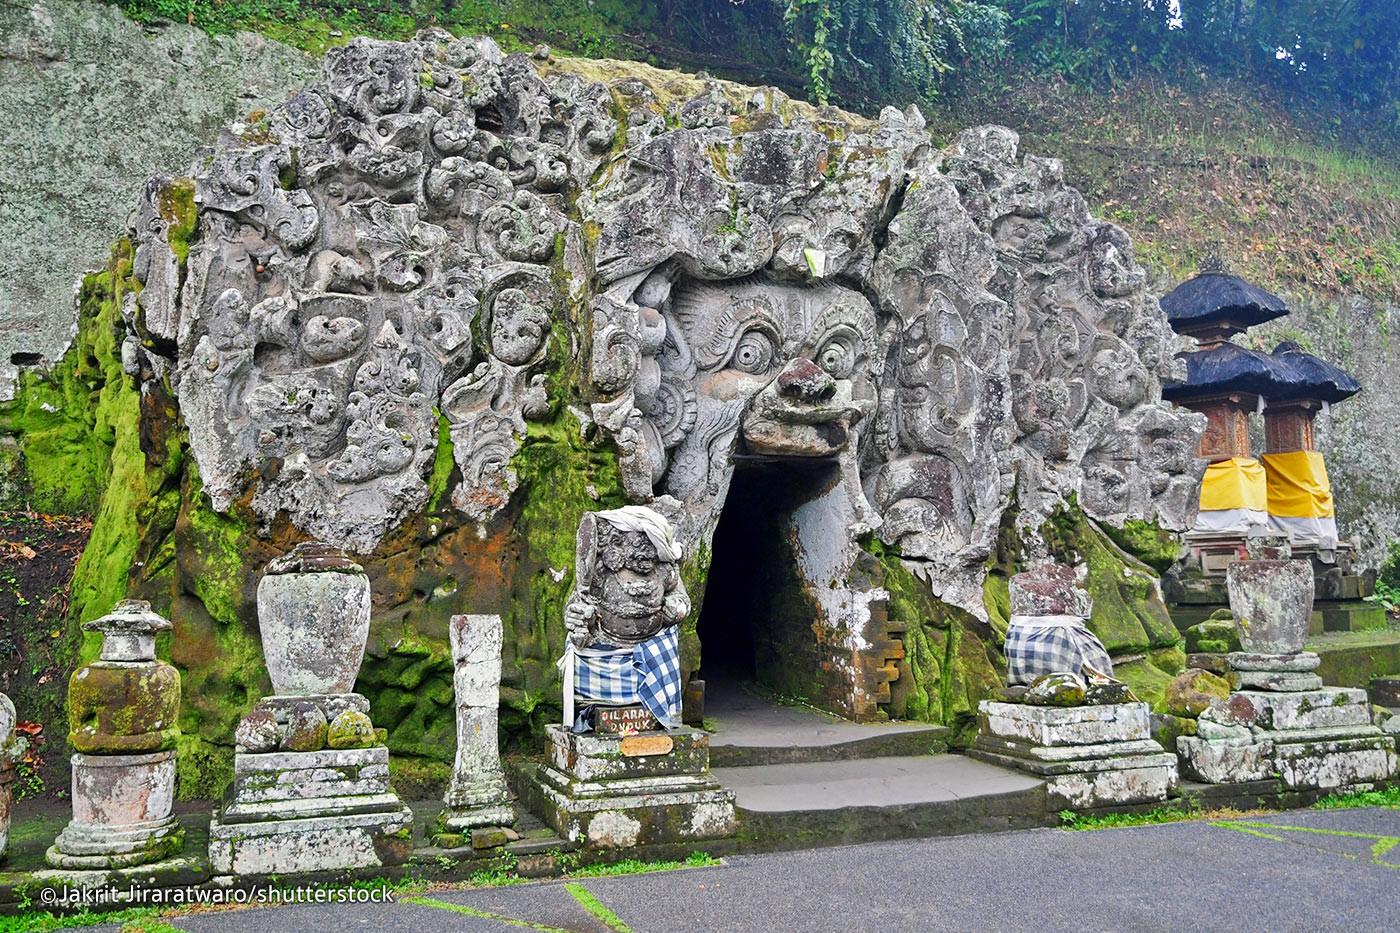 The elephant temple